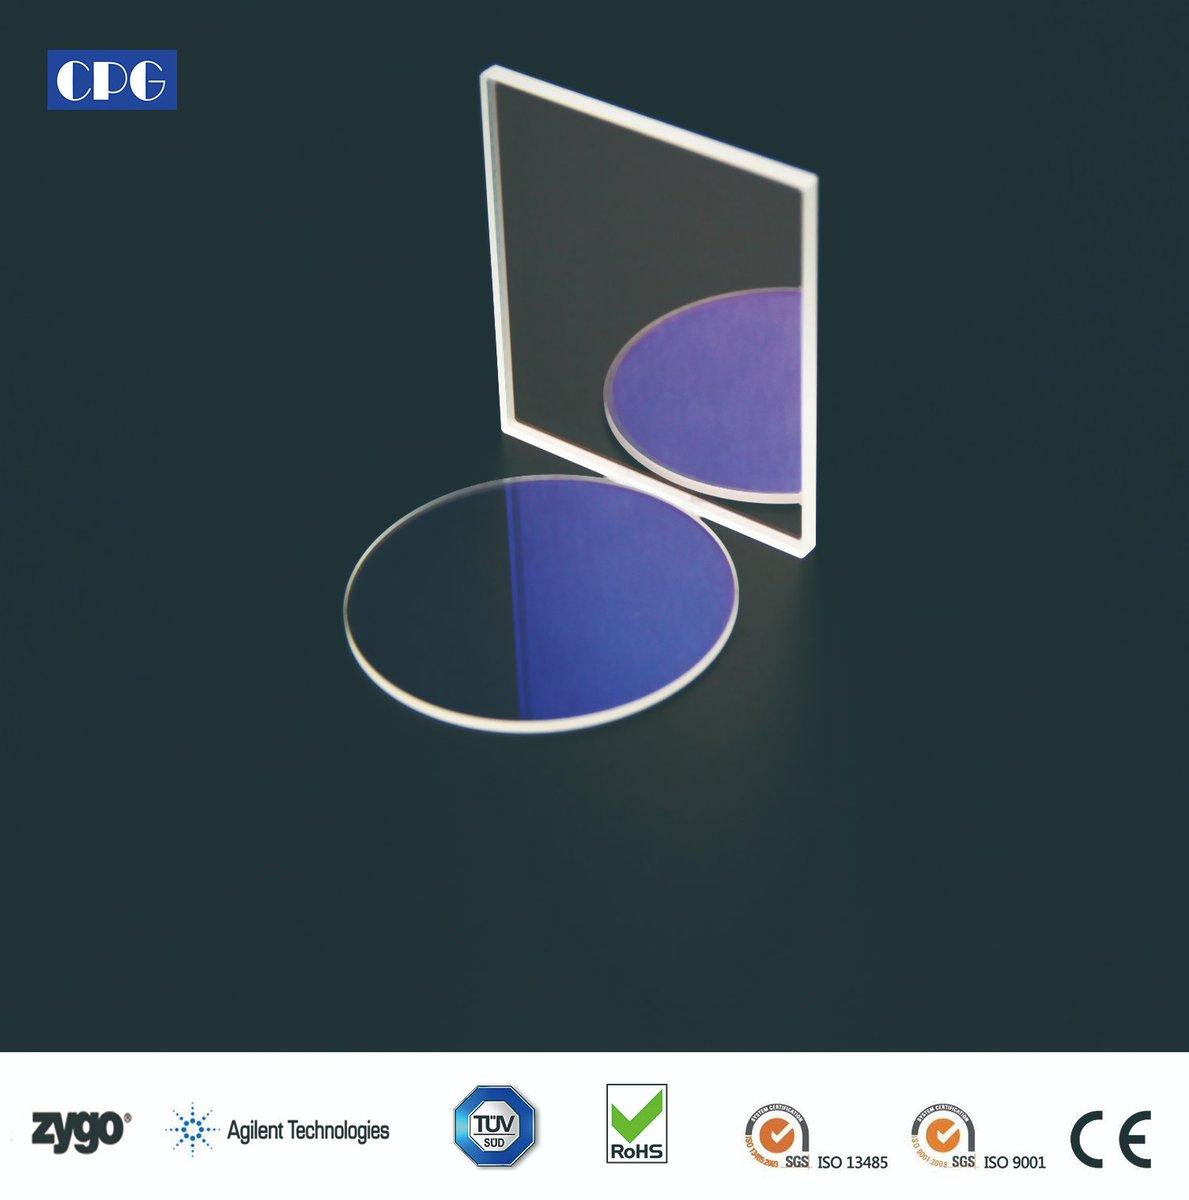 #Laser Level #Coated Sapphire/UVFS/Glass Protective #Window